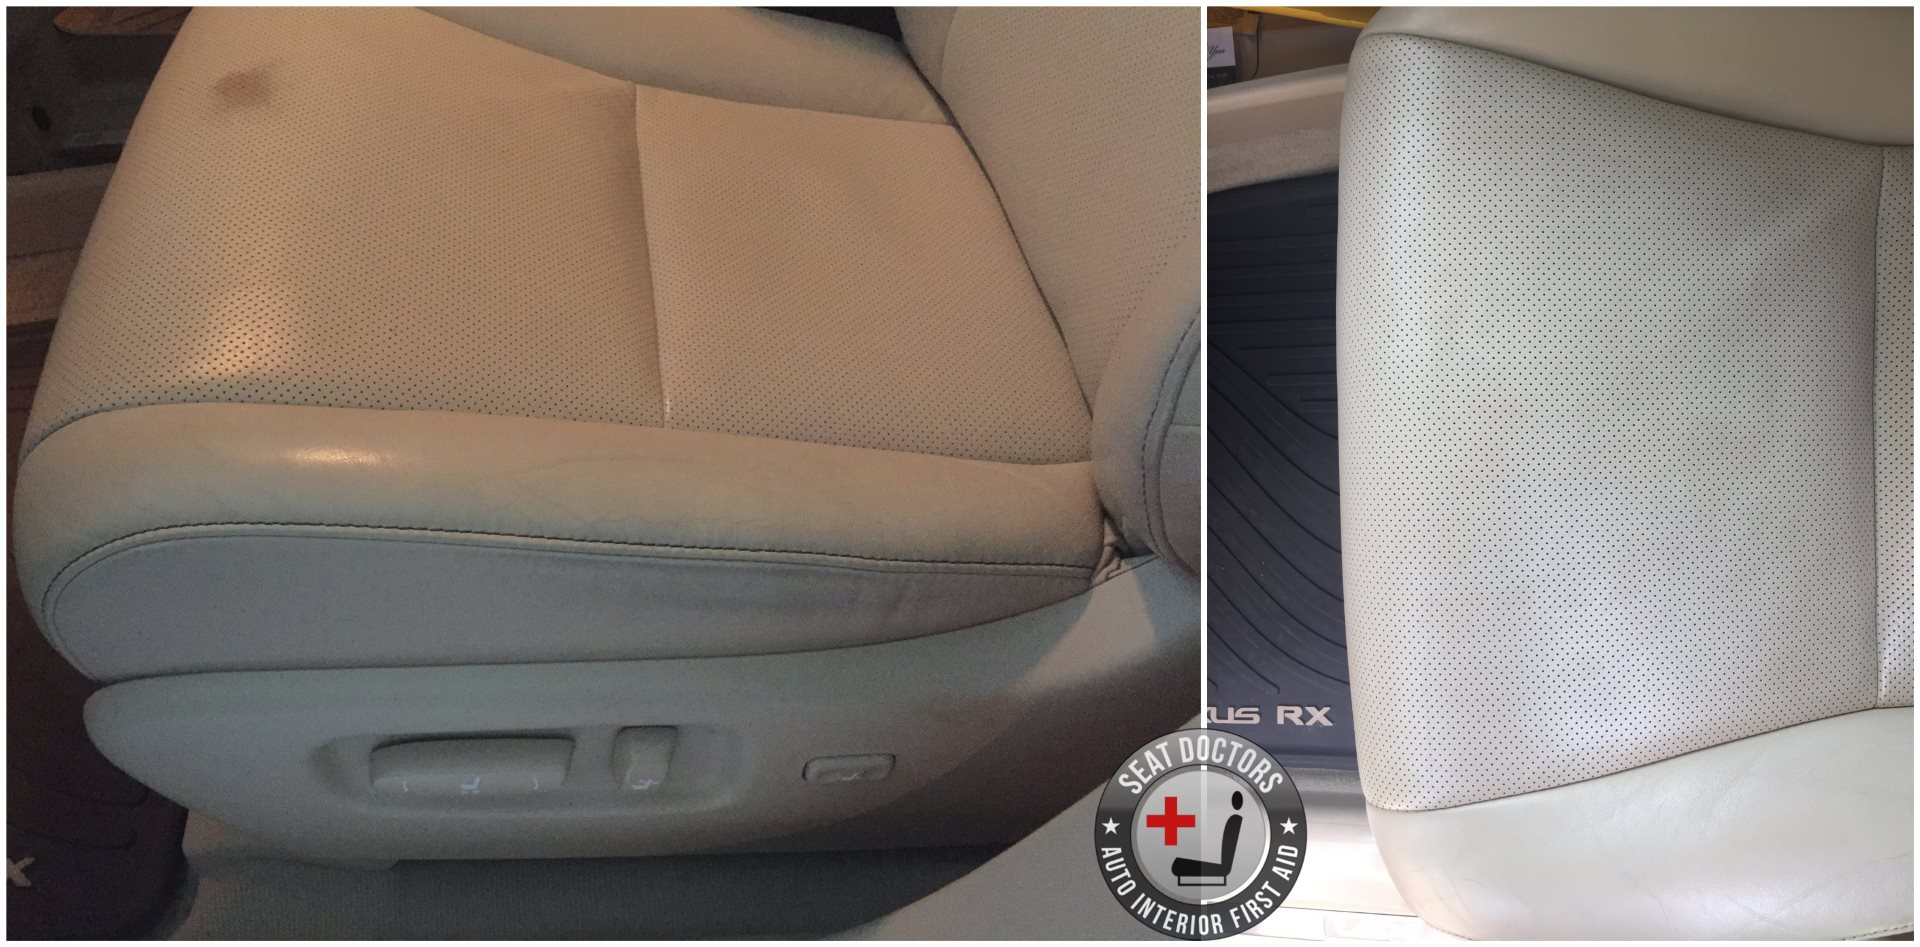 2015 Lexus RX350 leather dye.jpg